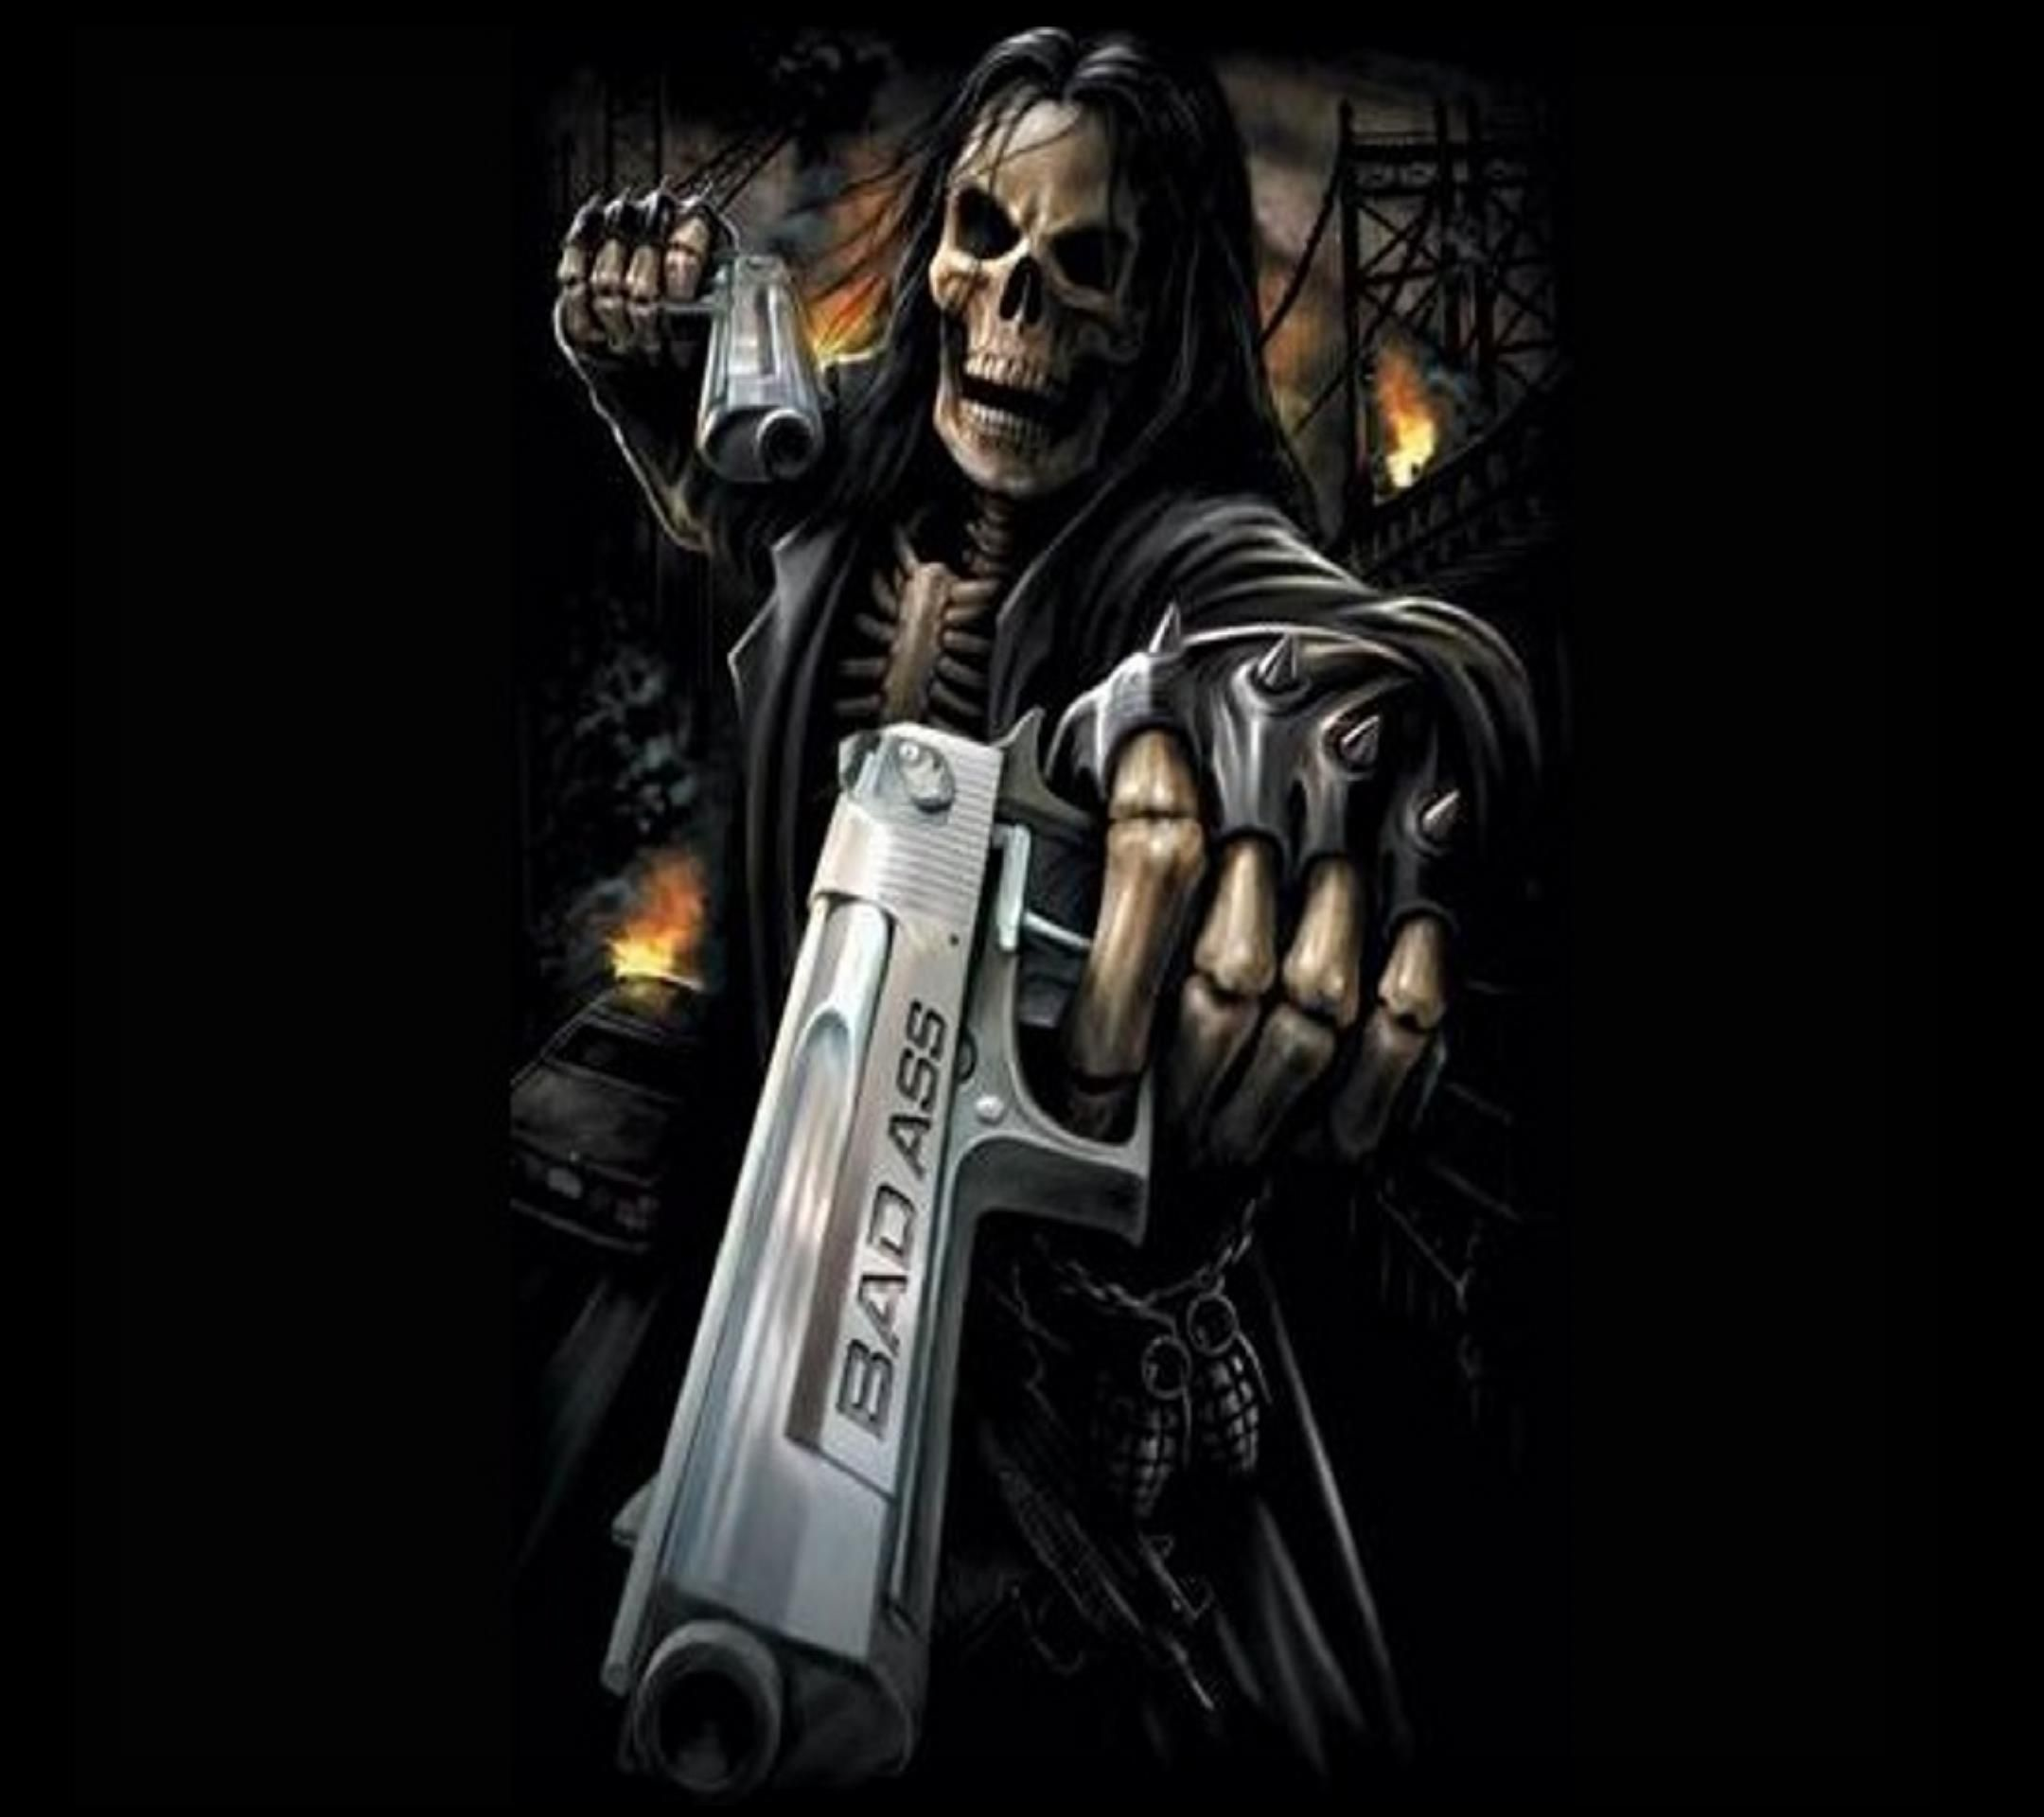 Badass Skulls Grim Reaper Skull Wallpaper Gun Fantasy Art Mobile Phones Pastels Tattoo Drawings Football Team